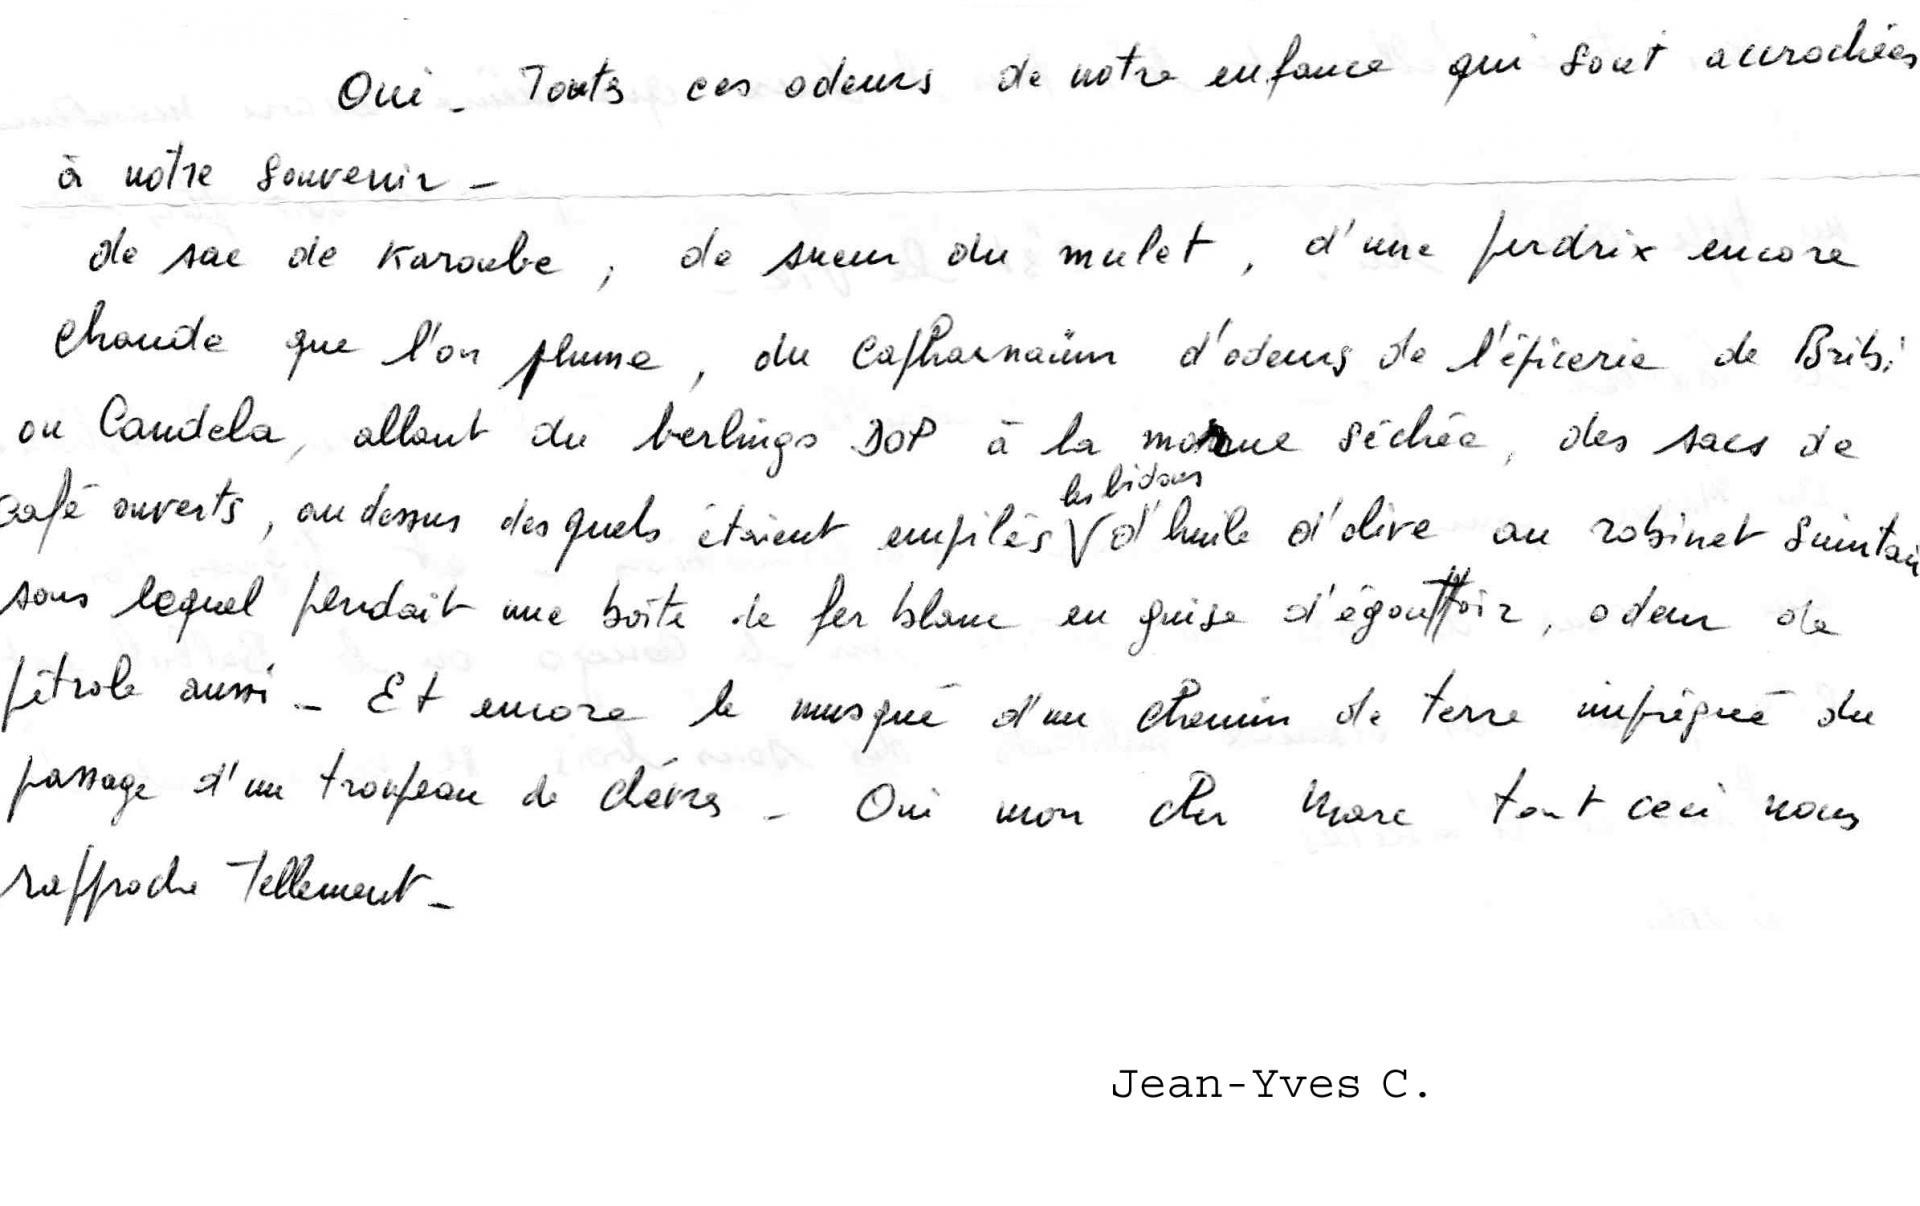 Jean Yves C